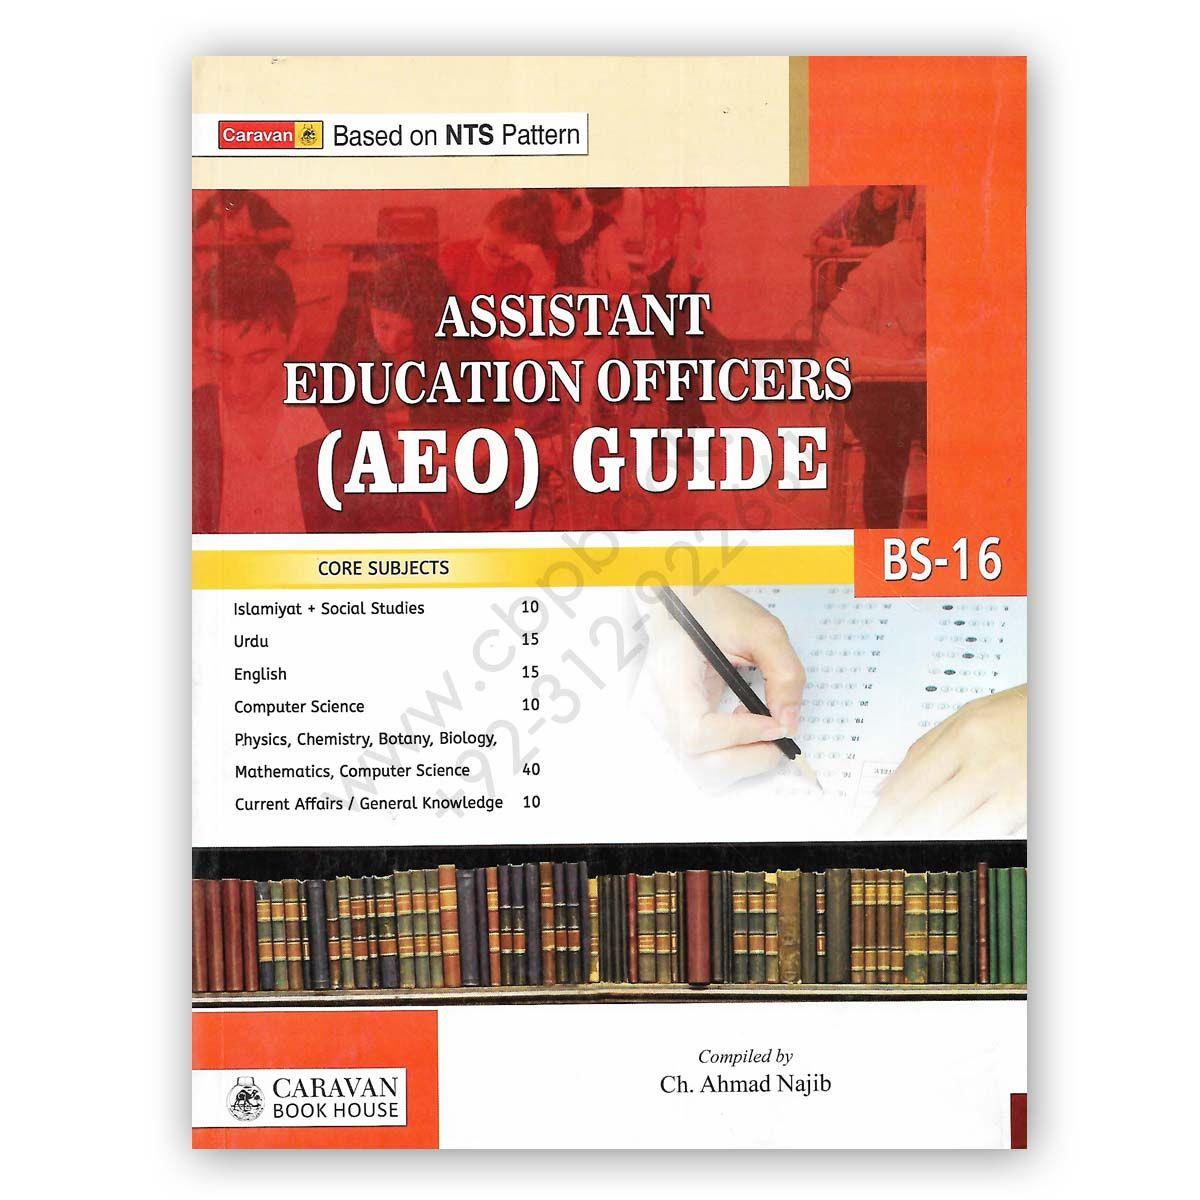 Nts Assistant Education Officers Aeo Guide Bs 16 Caravan Book Cbpbook Pakistan S Largest Online Book Store Education Online Bookstore Everyday Science